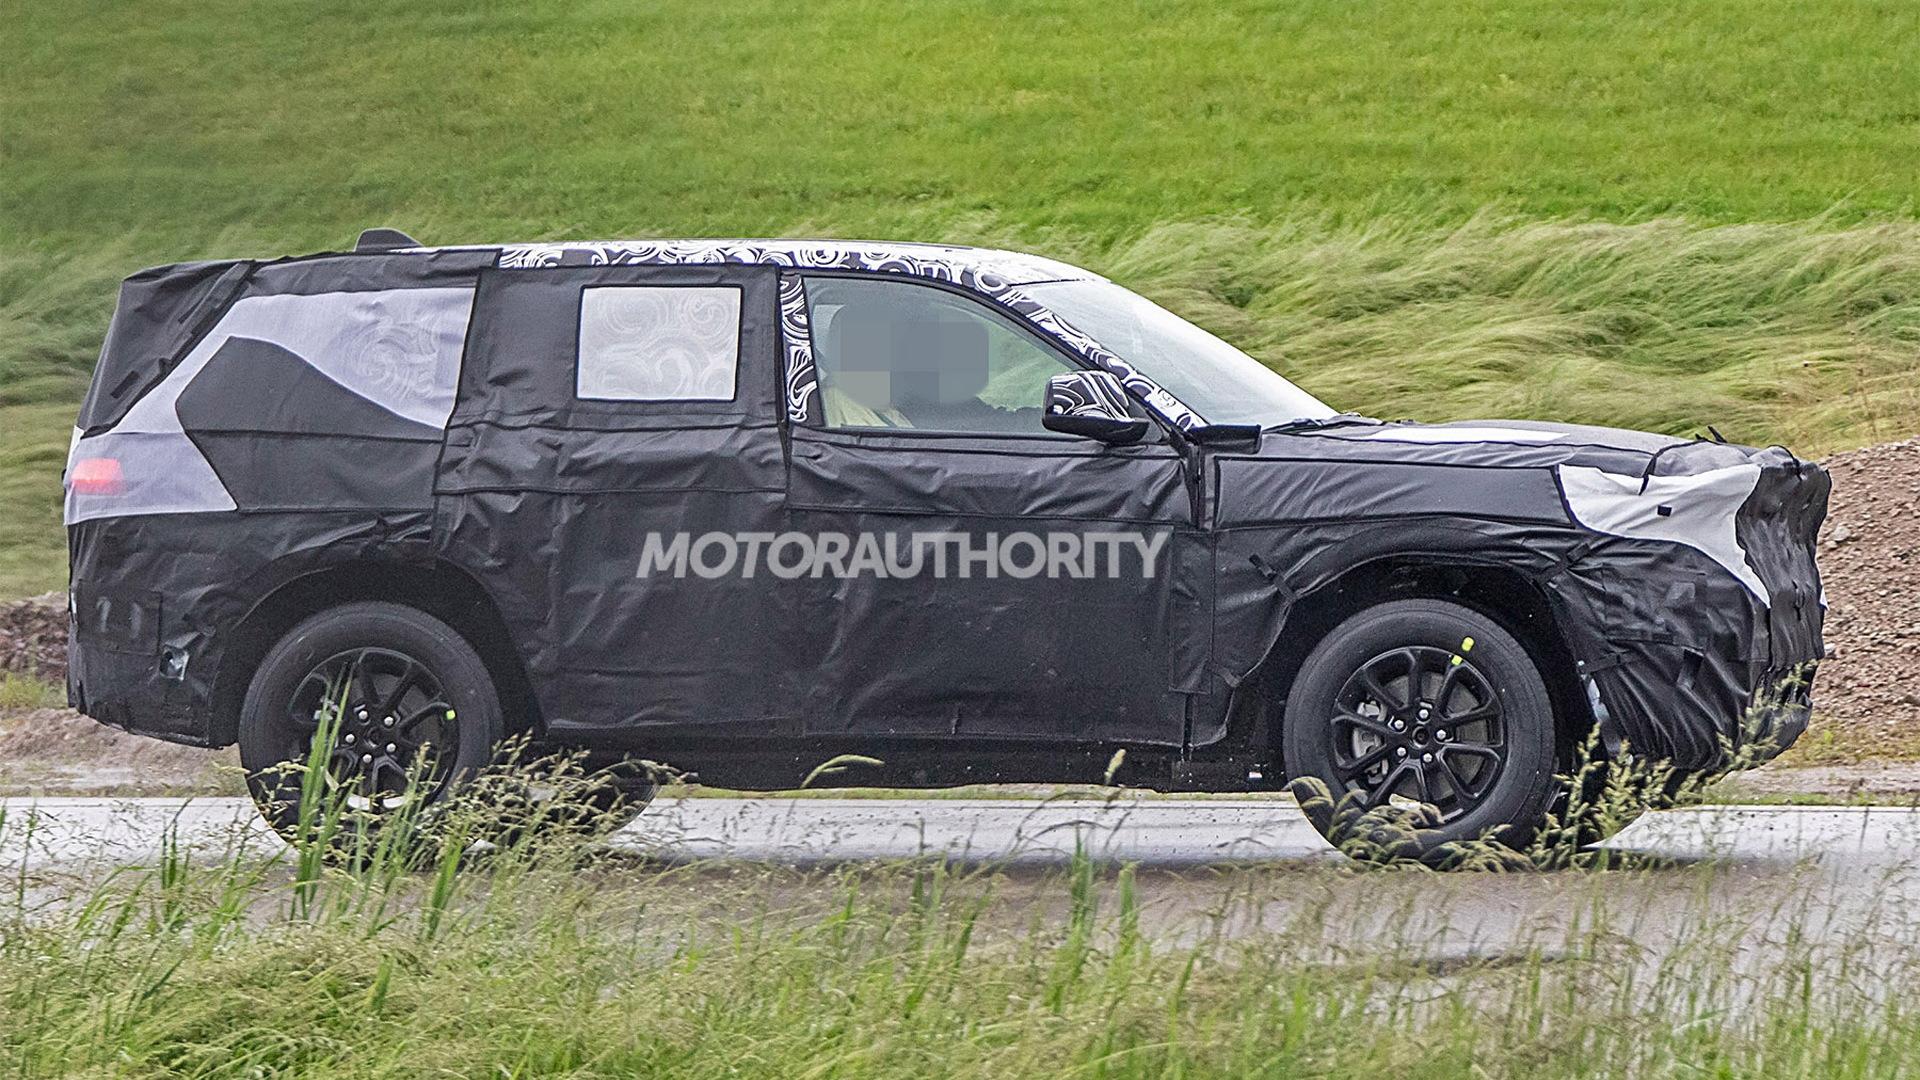 2021 Jeep Grand Cherokee spy shots - Image via S. Baldauf/SB-Medien